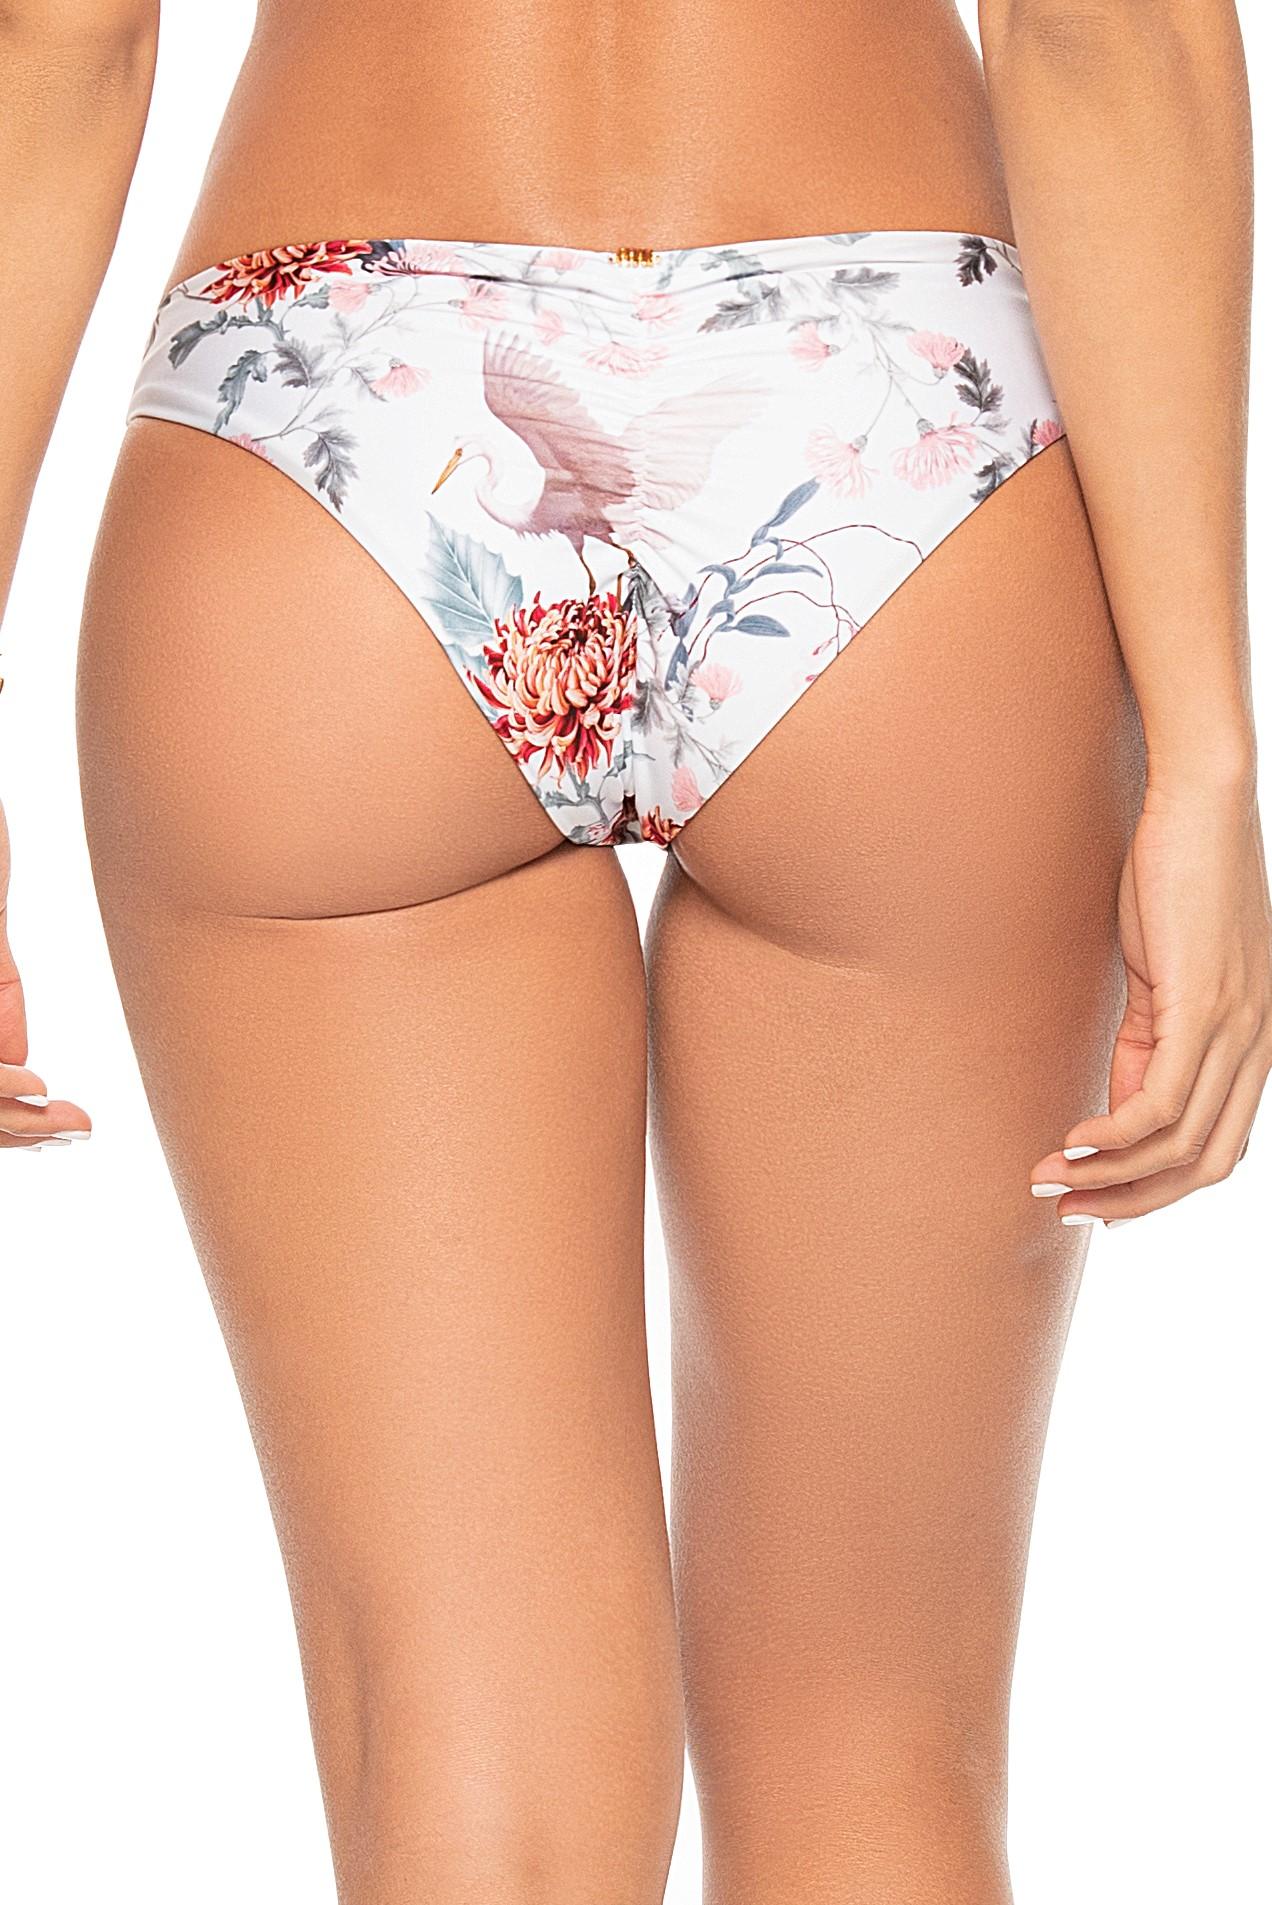 Phax Bella Paris Scrunch Bikini Bottom